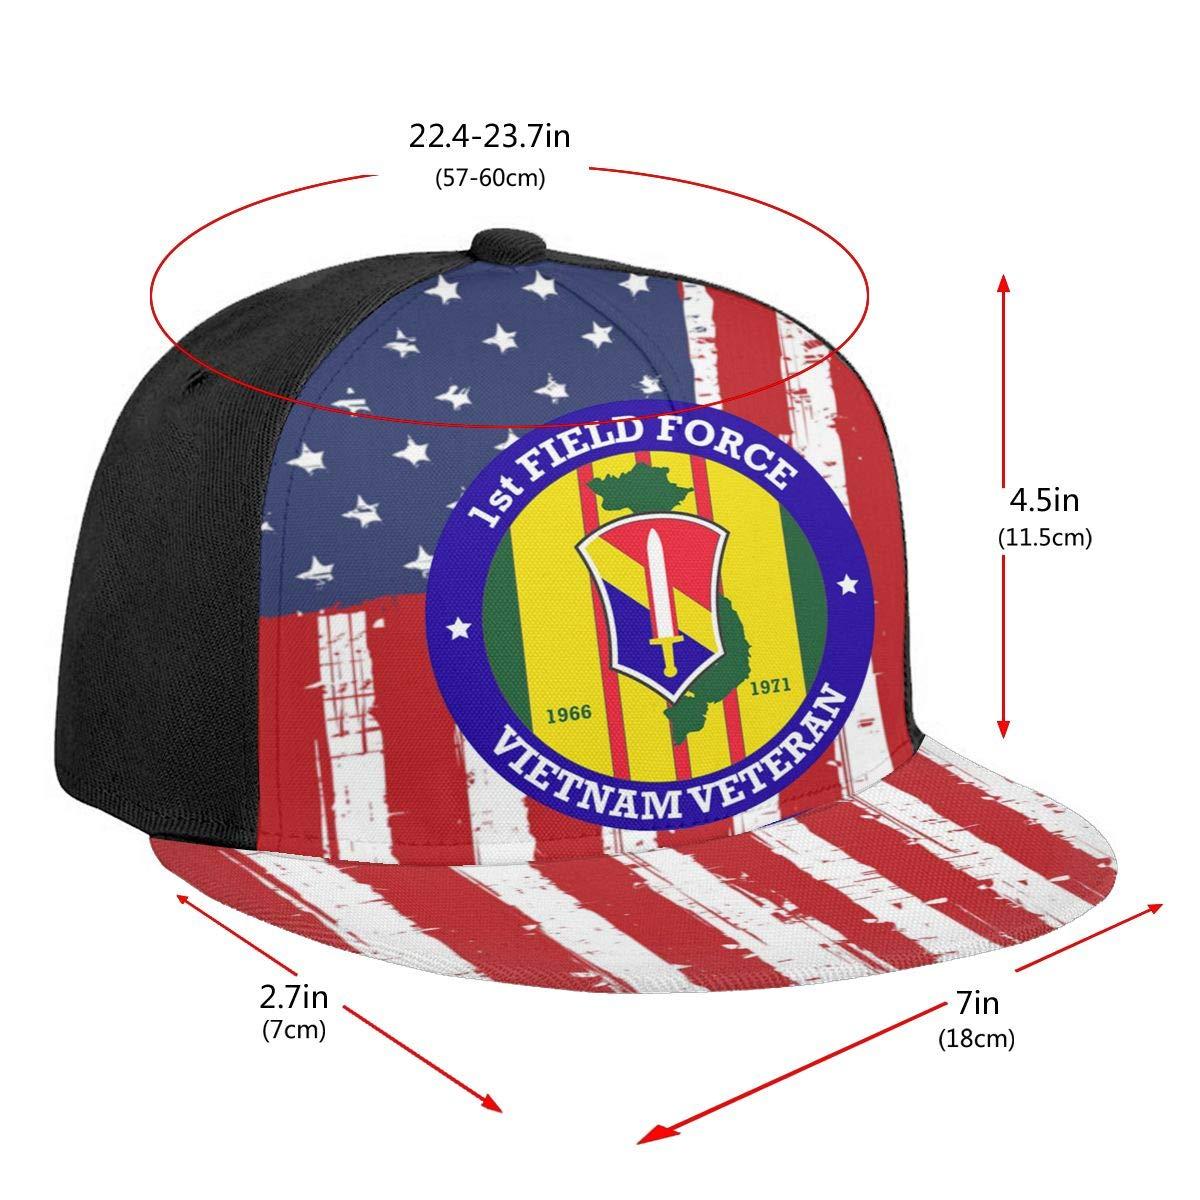 1st Field Force Vietnam Veteran Unisex Adult Hats Classic Baseball Caps Peaked Cap